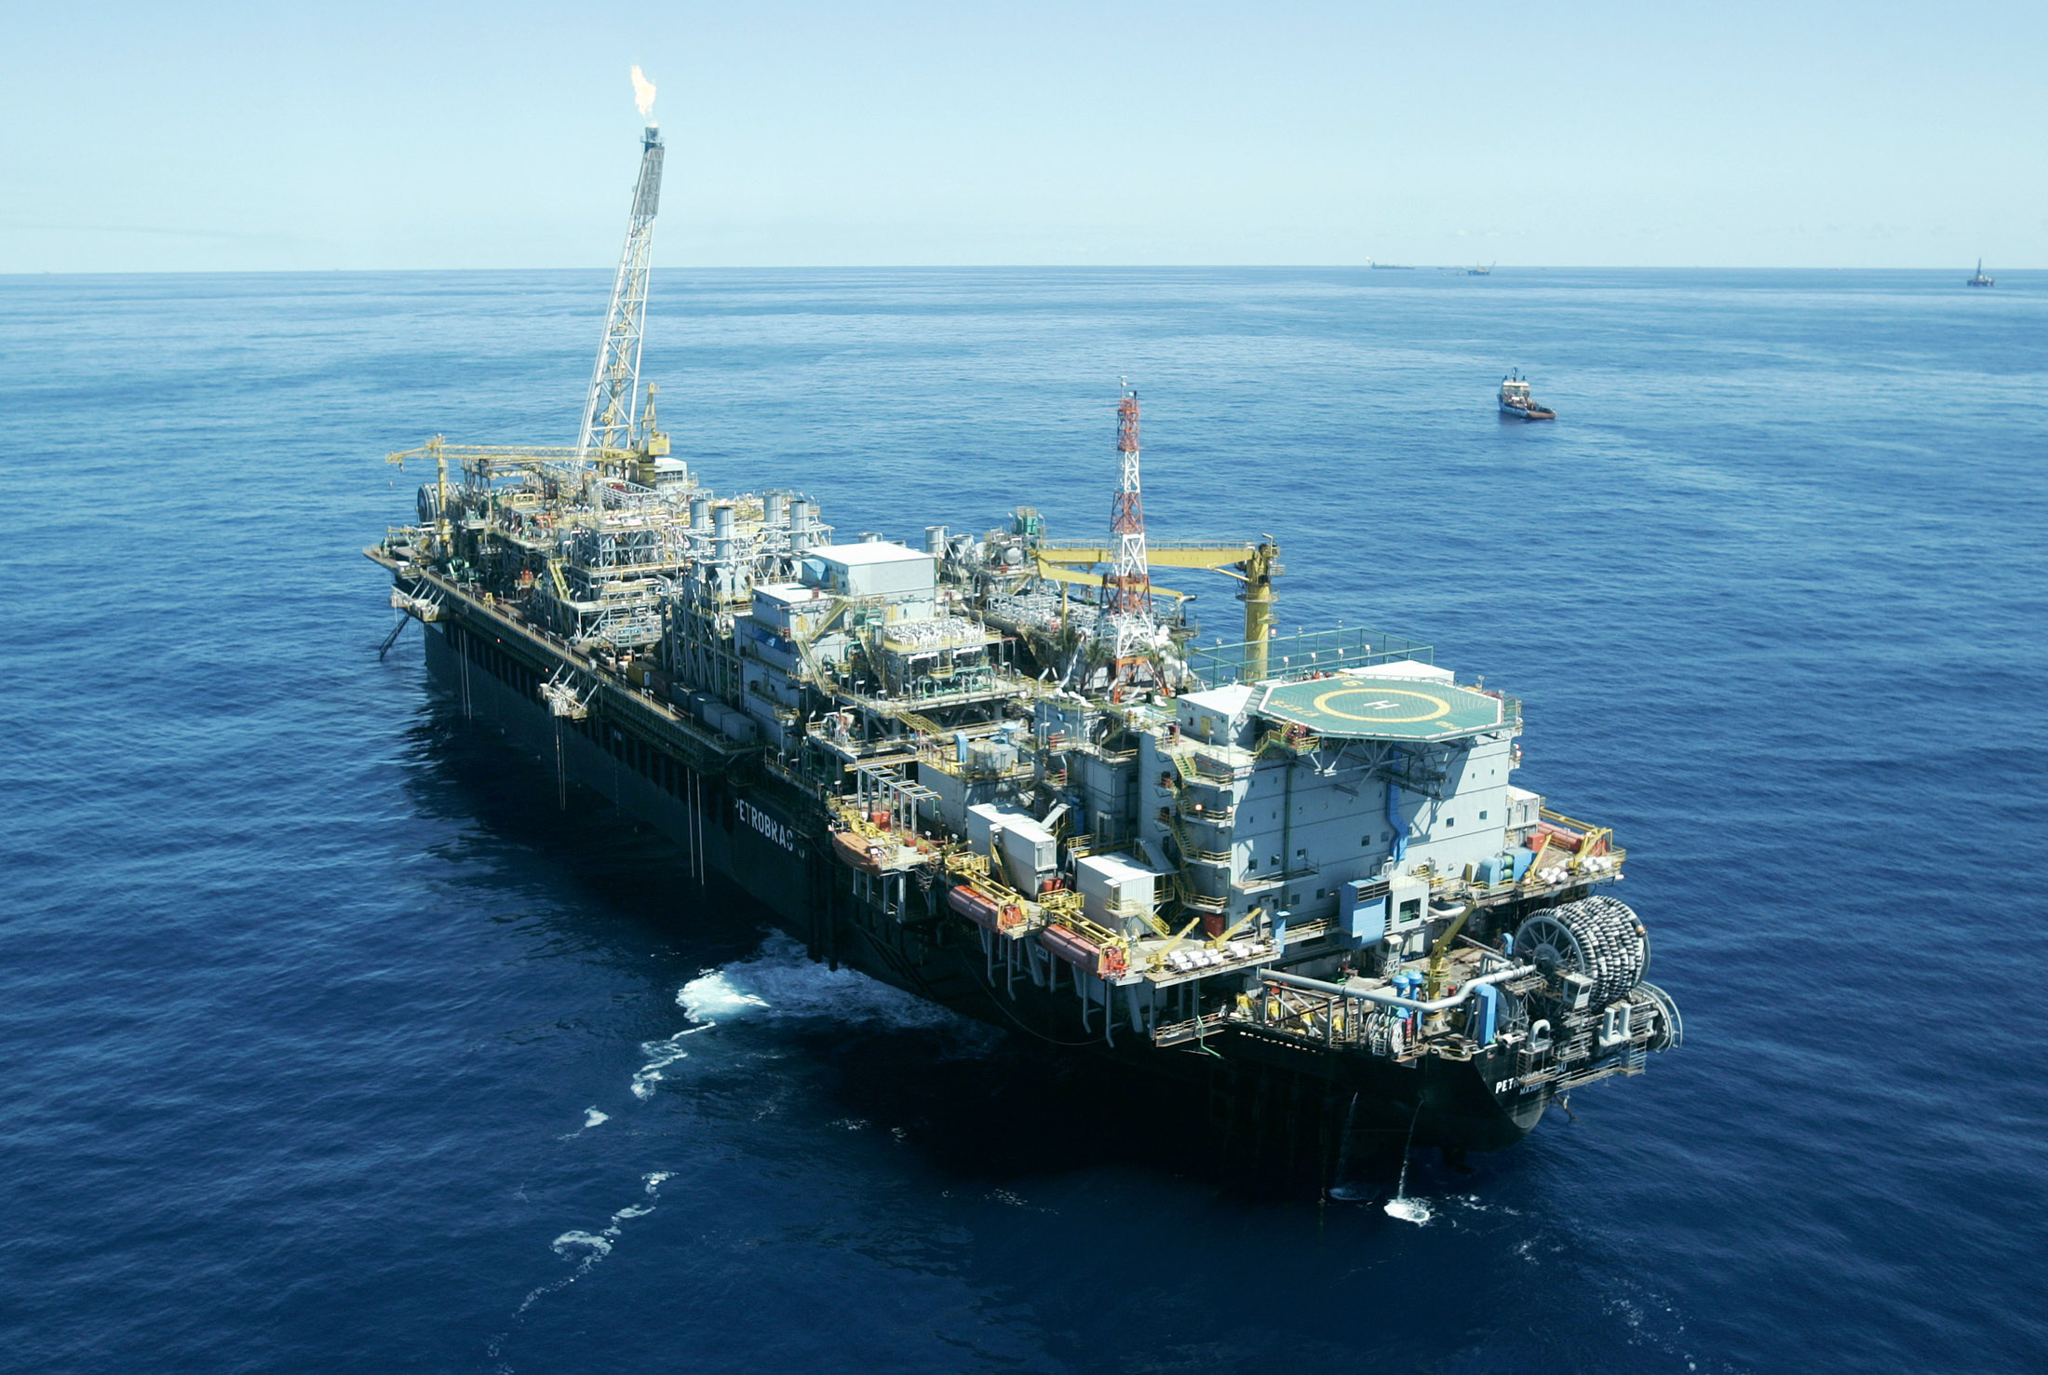 petroleo - Enauta